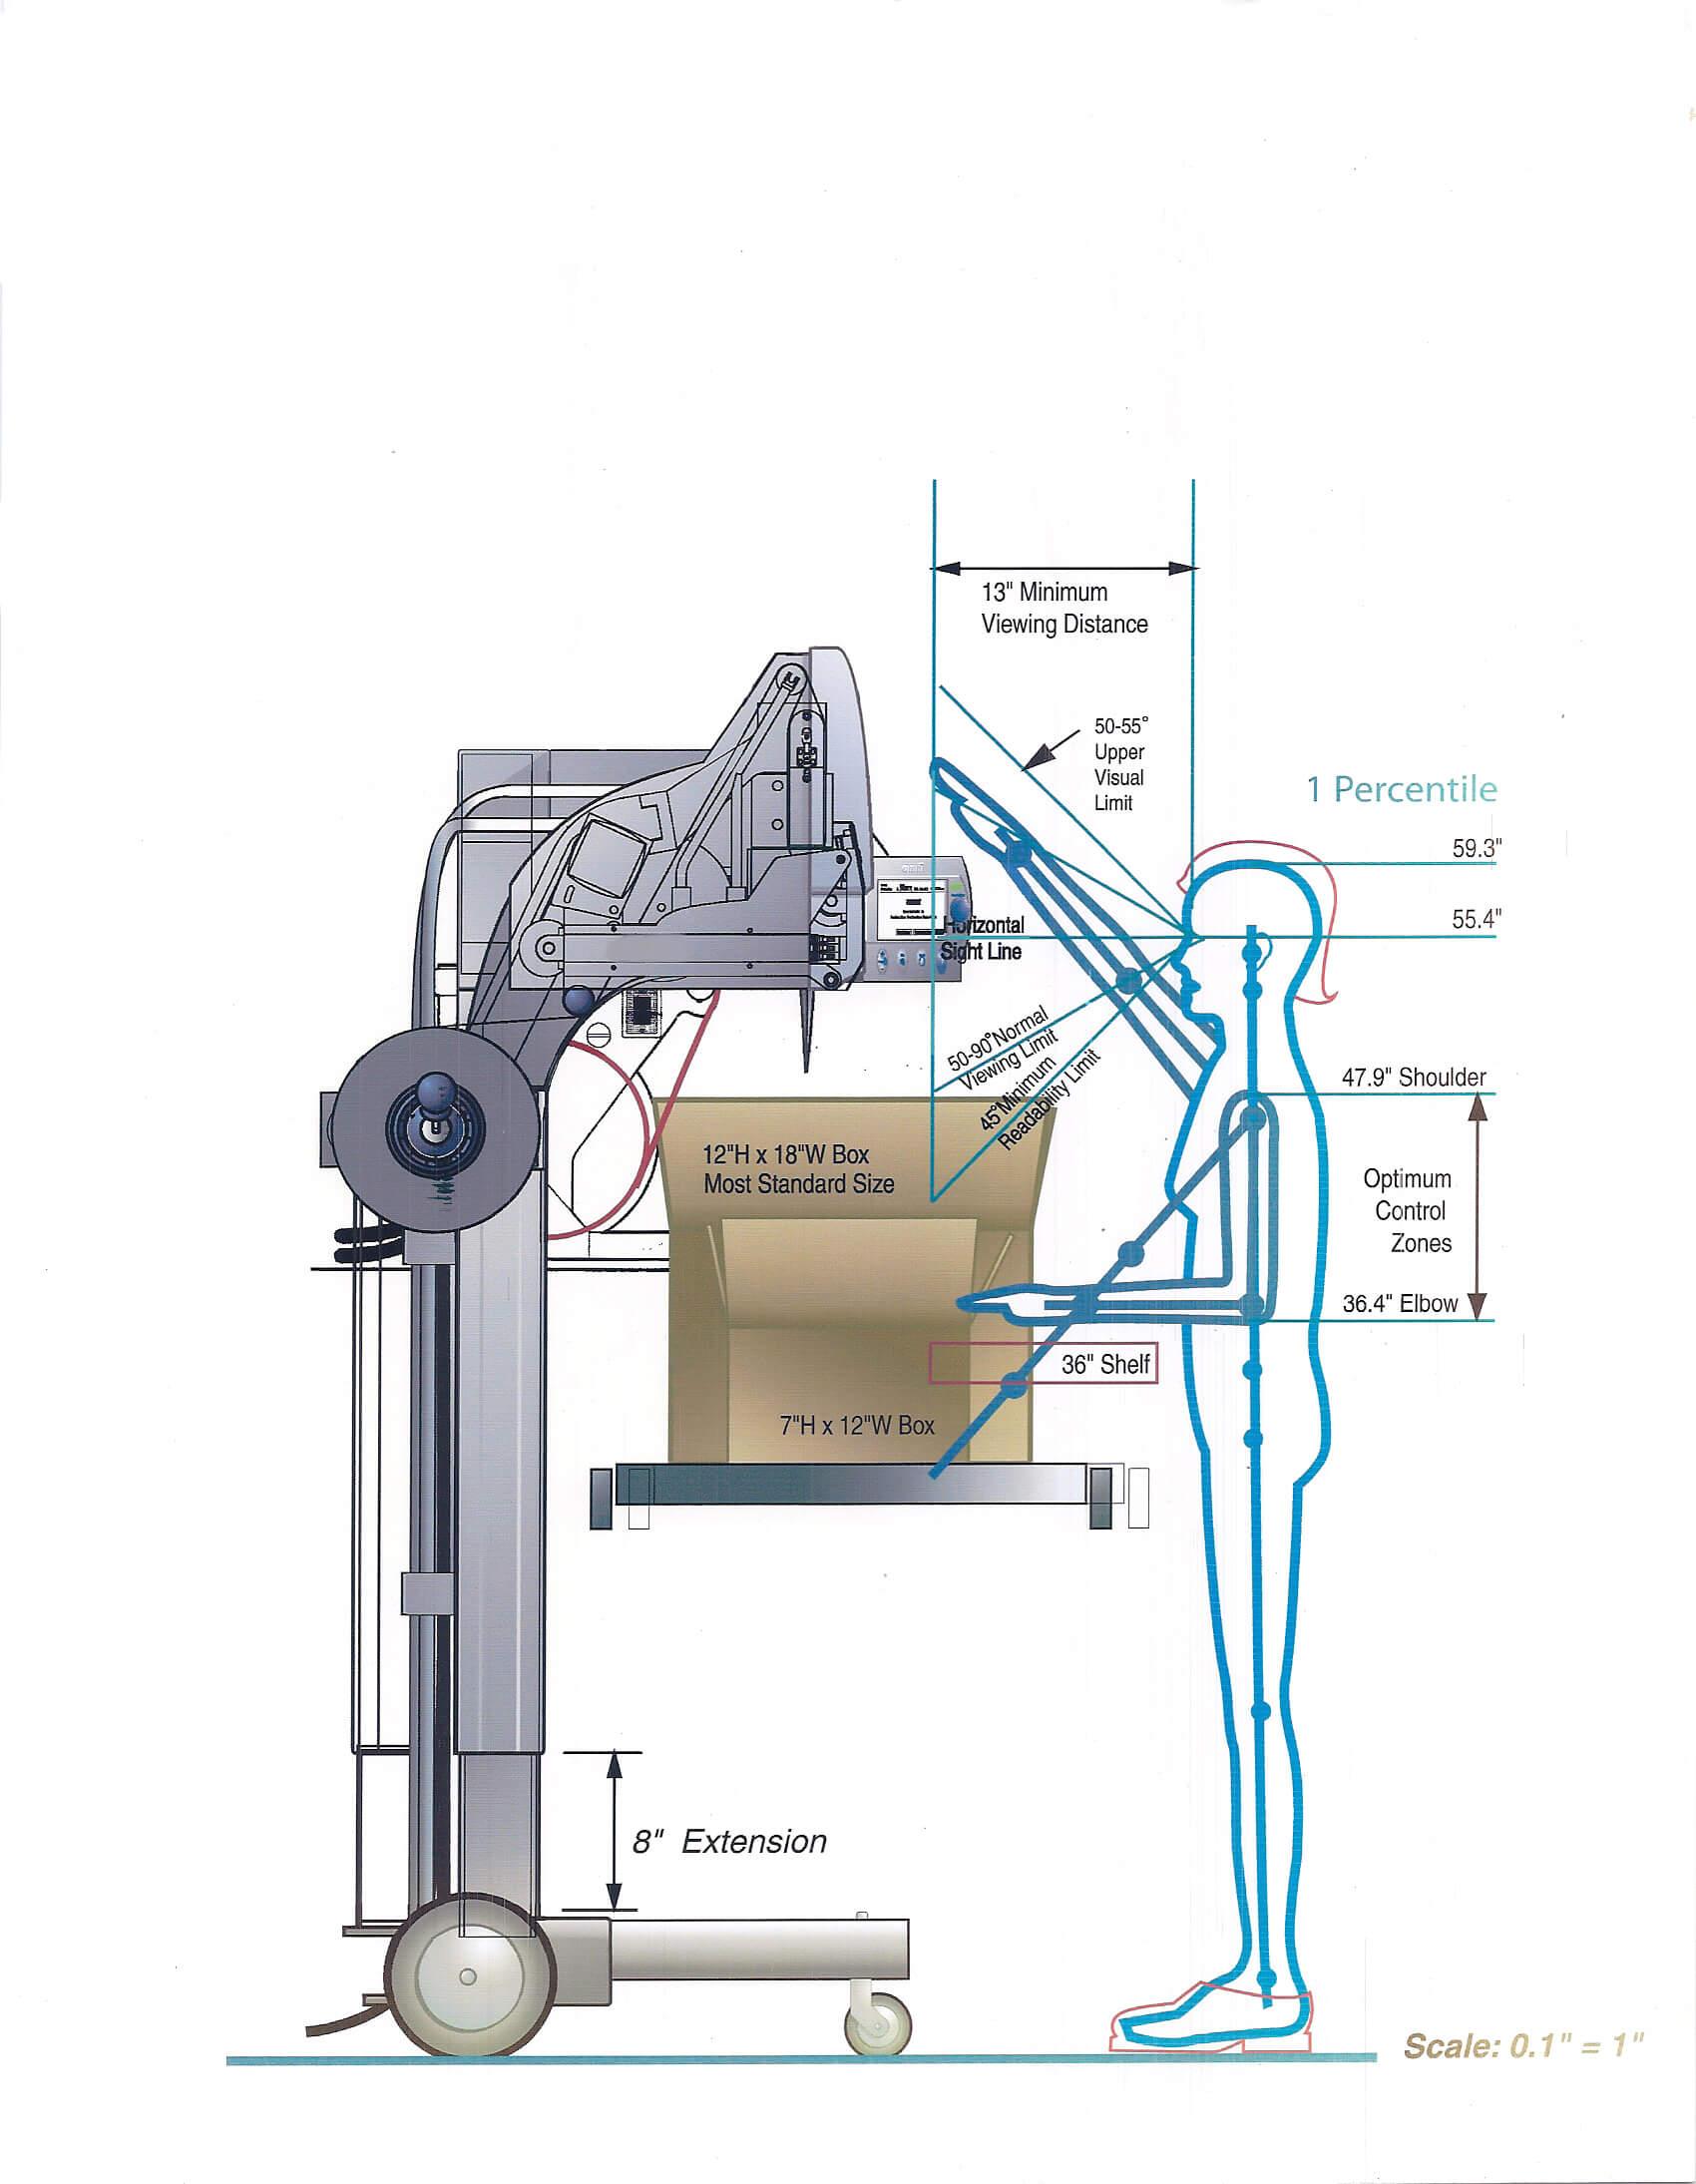 Machine ergonomics